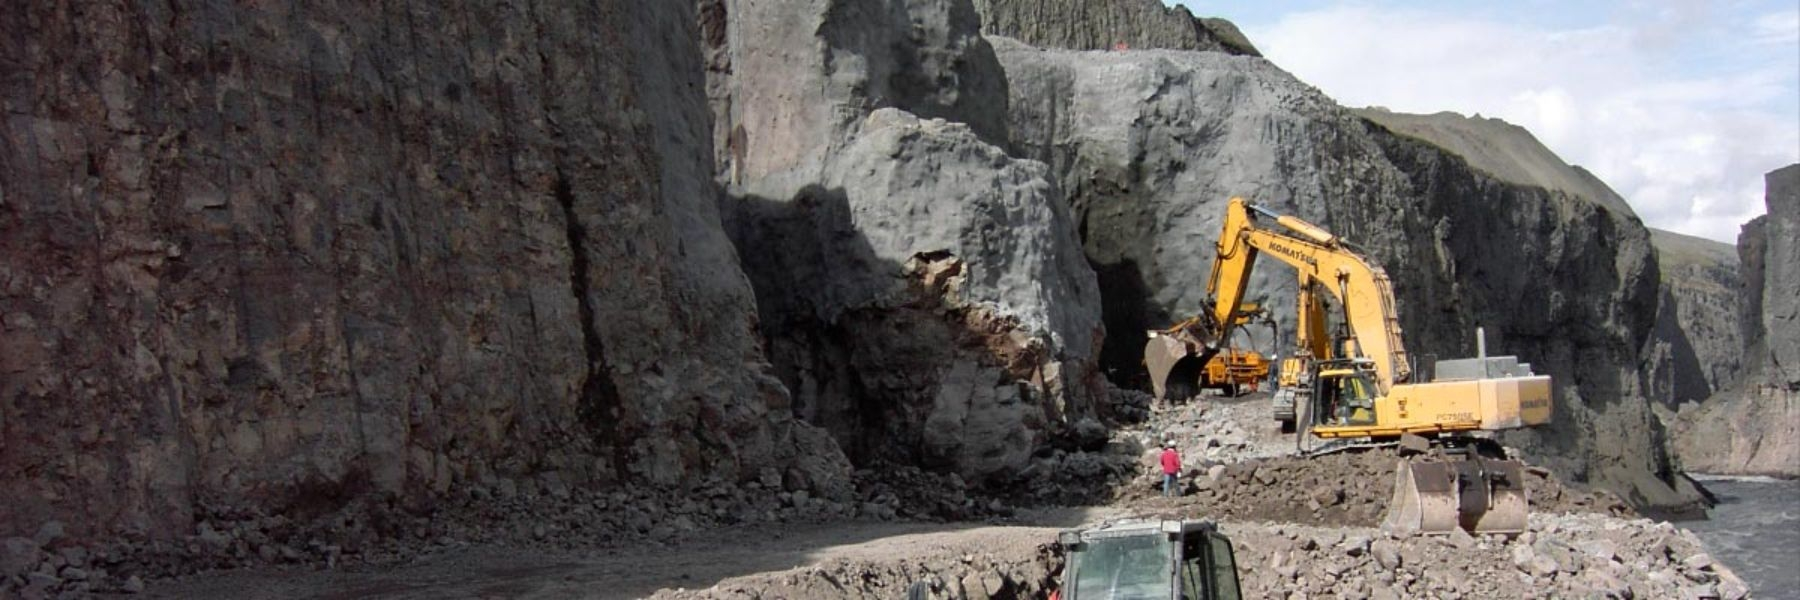 MINERARIO | minerario slide 03(1)